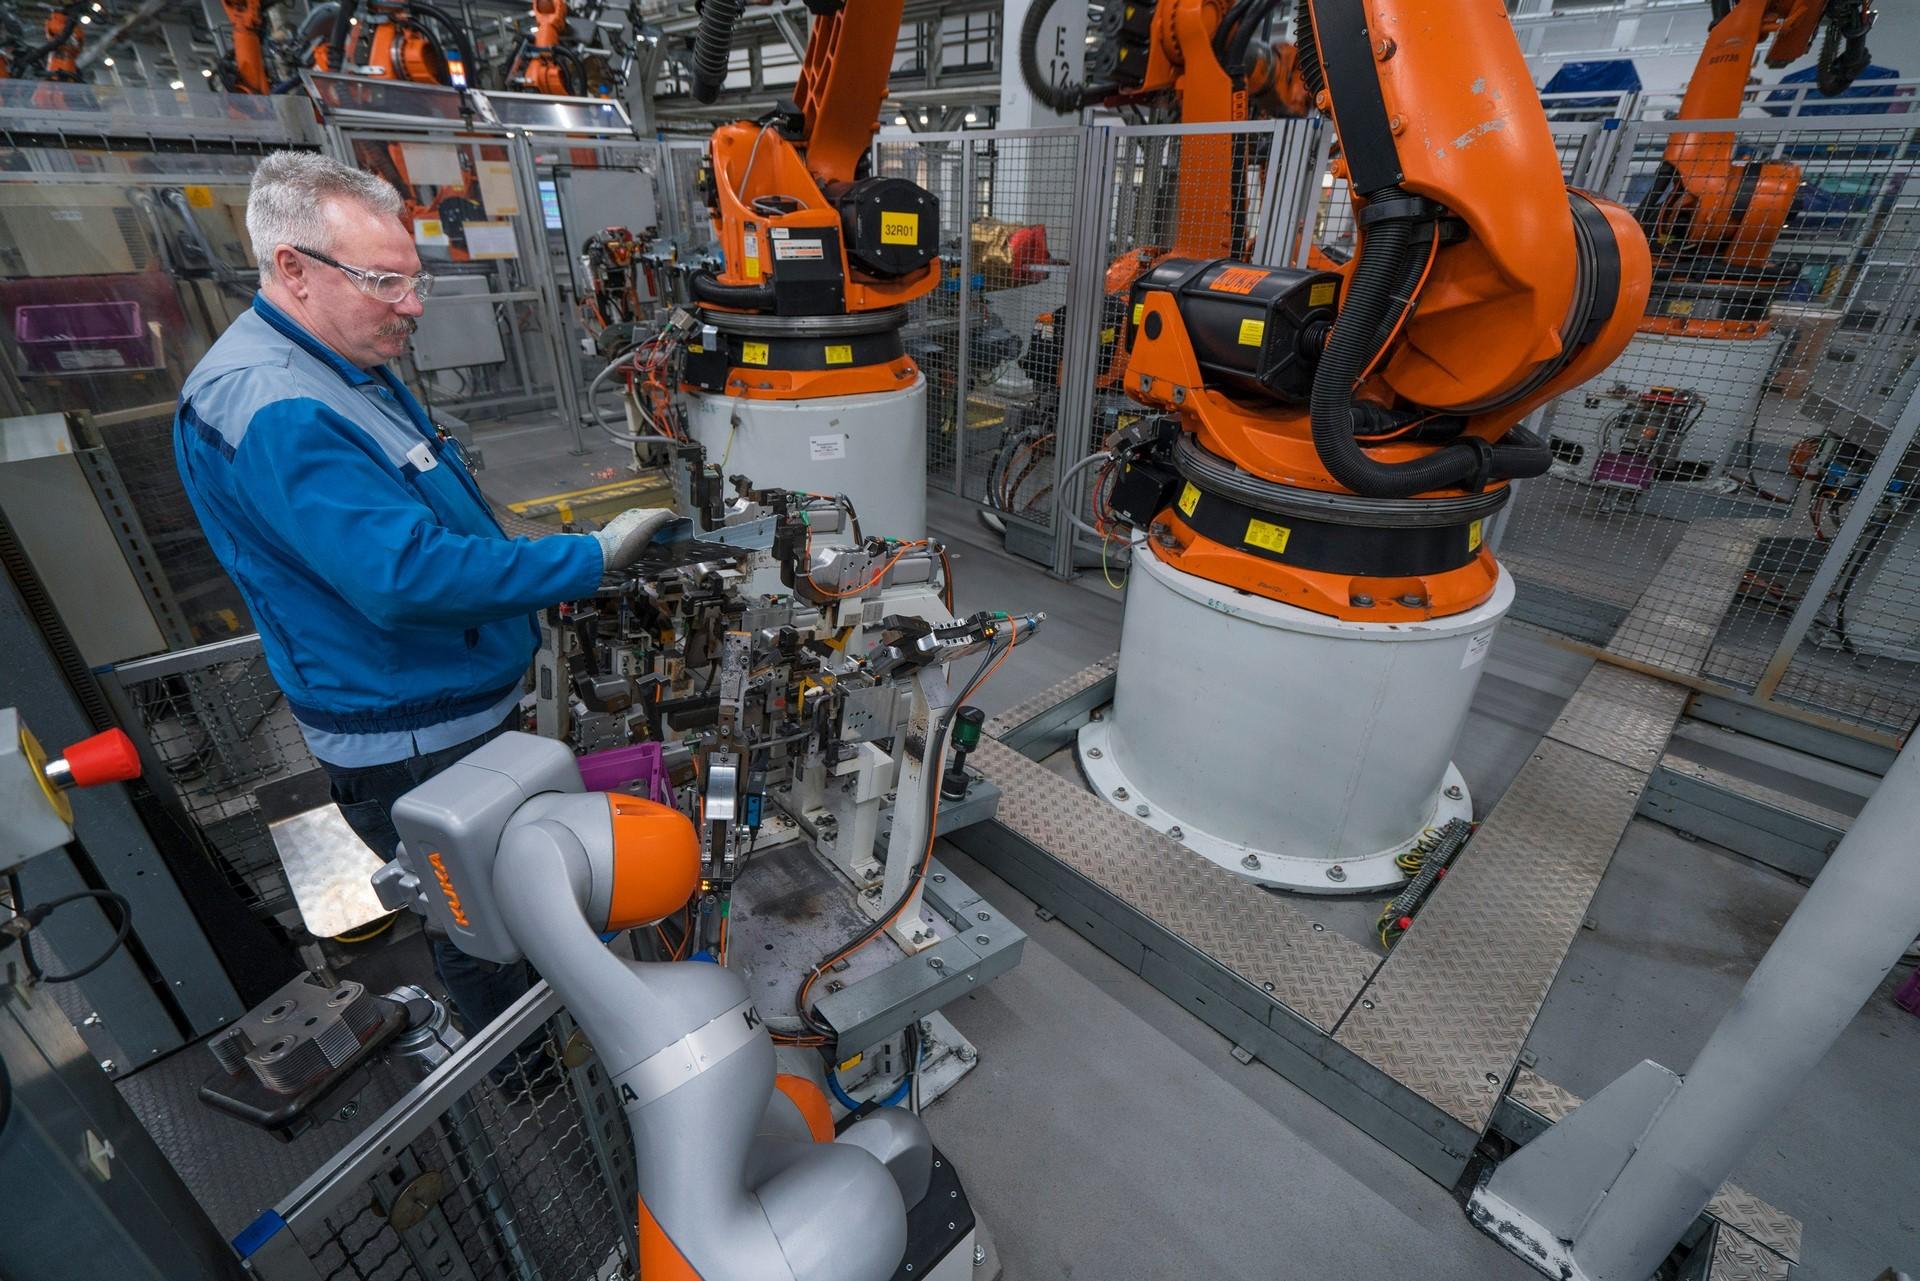 BMW humans robots (40)